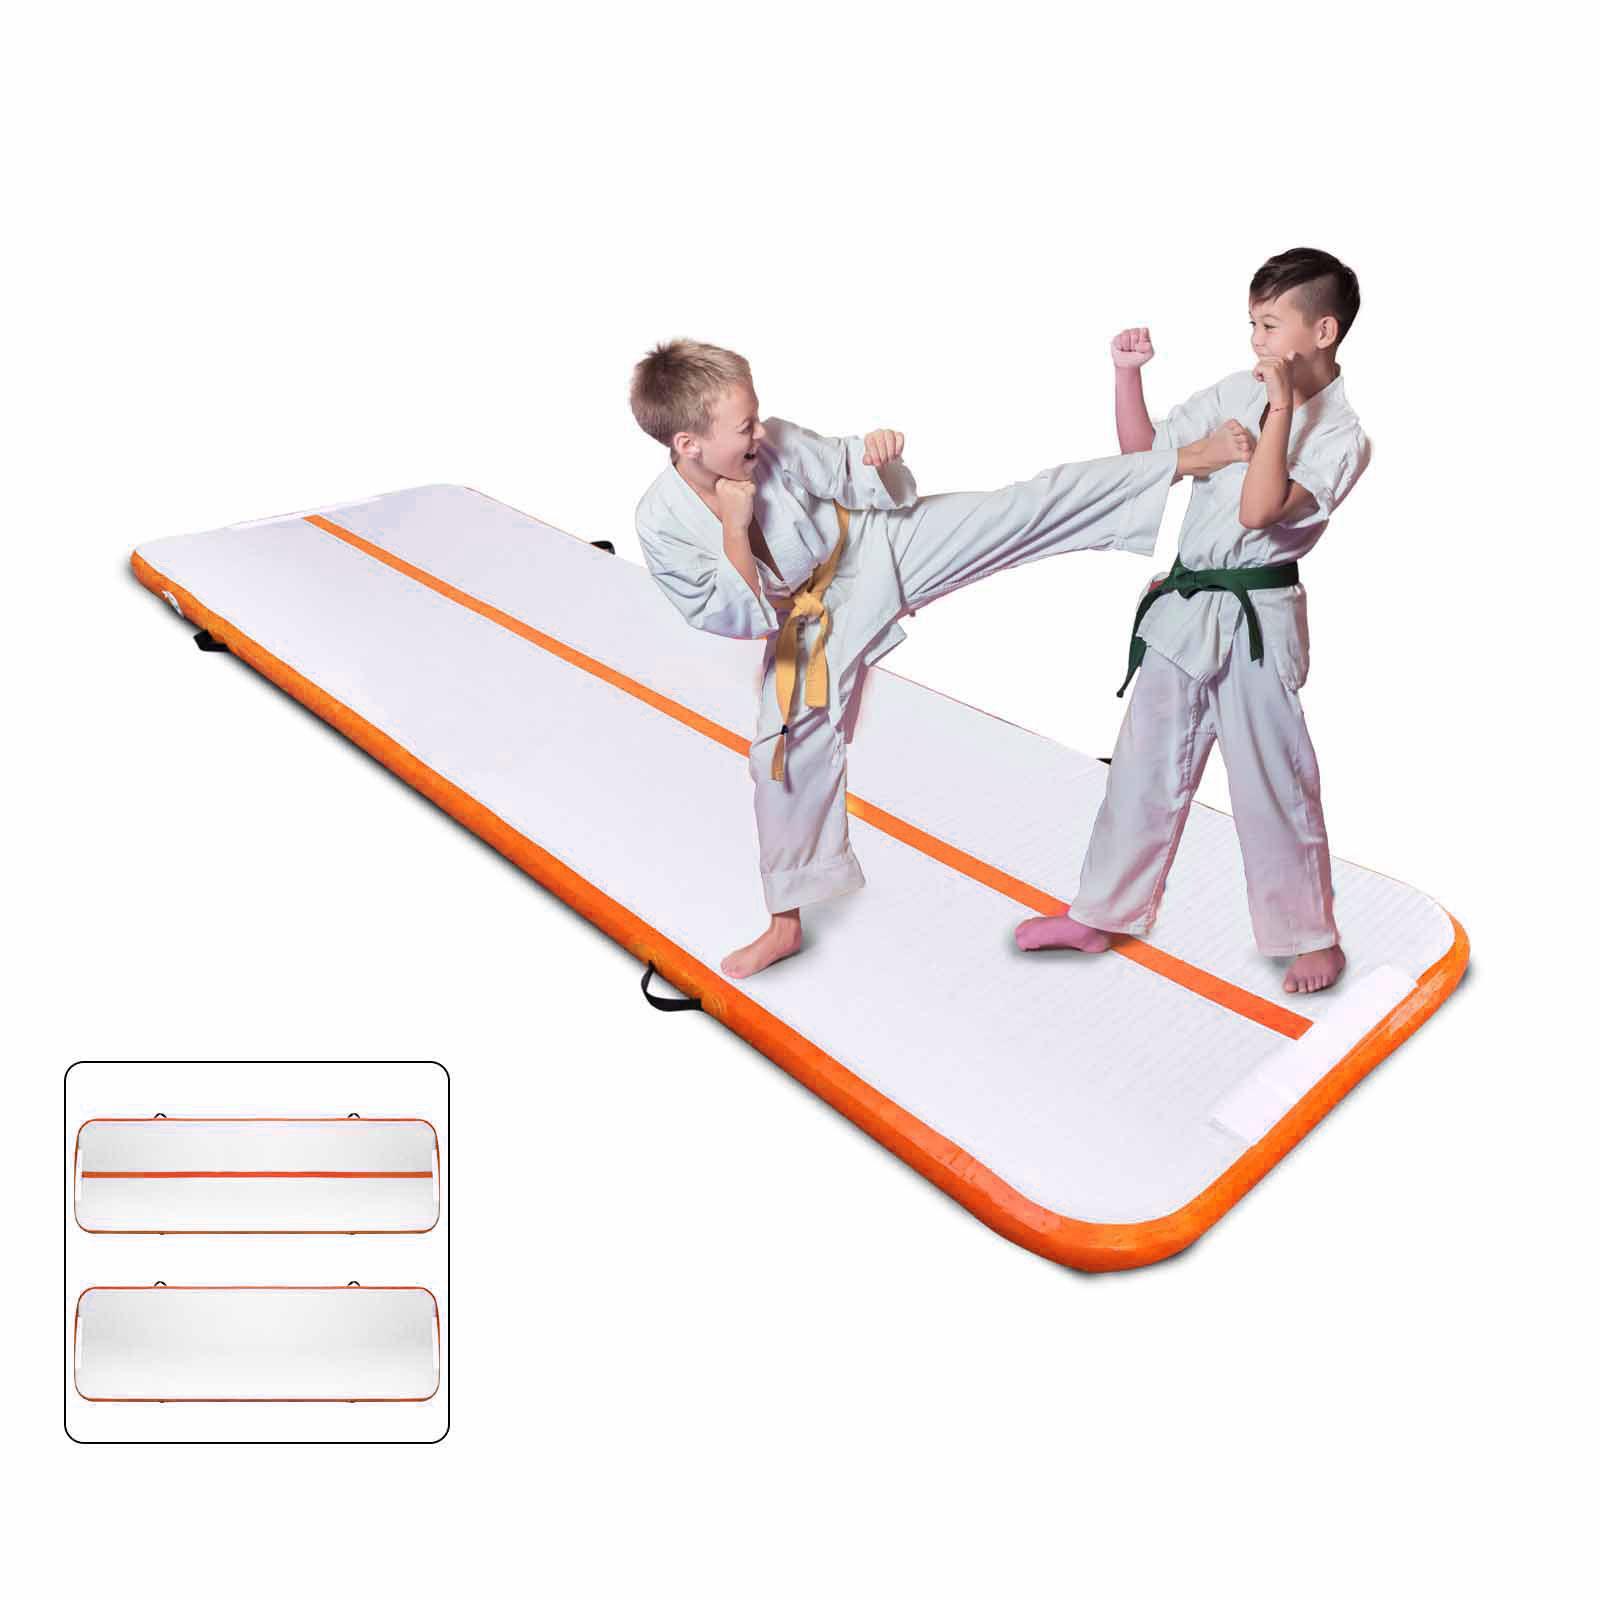 Gofun AirTrack Inflatable Air Track Floor Home Gymnastics